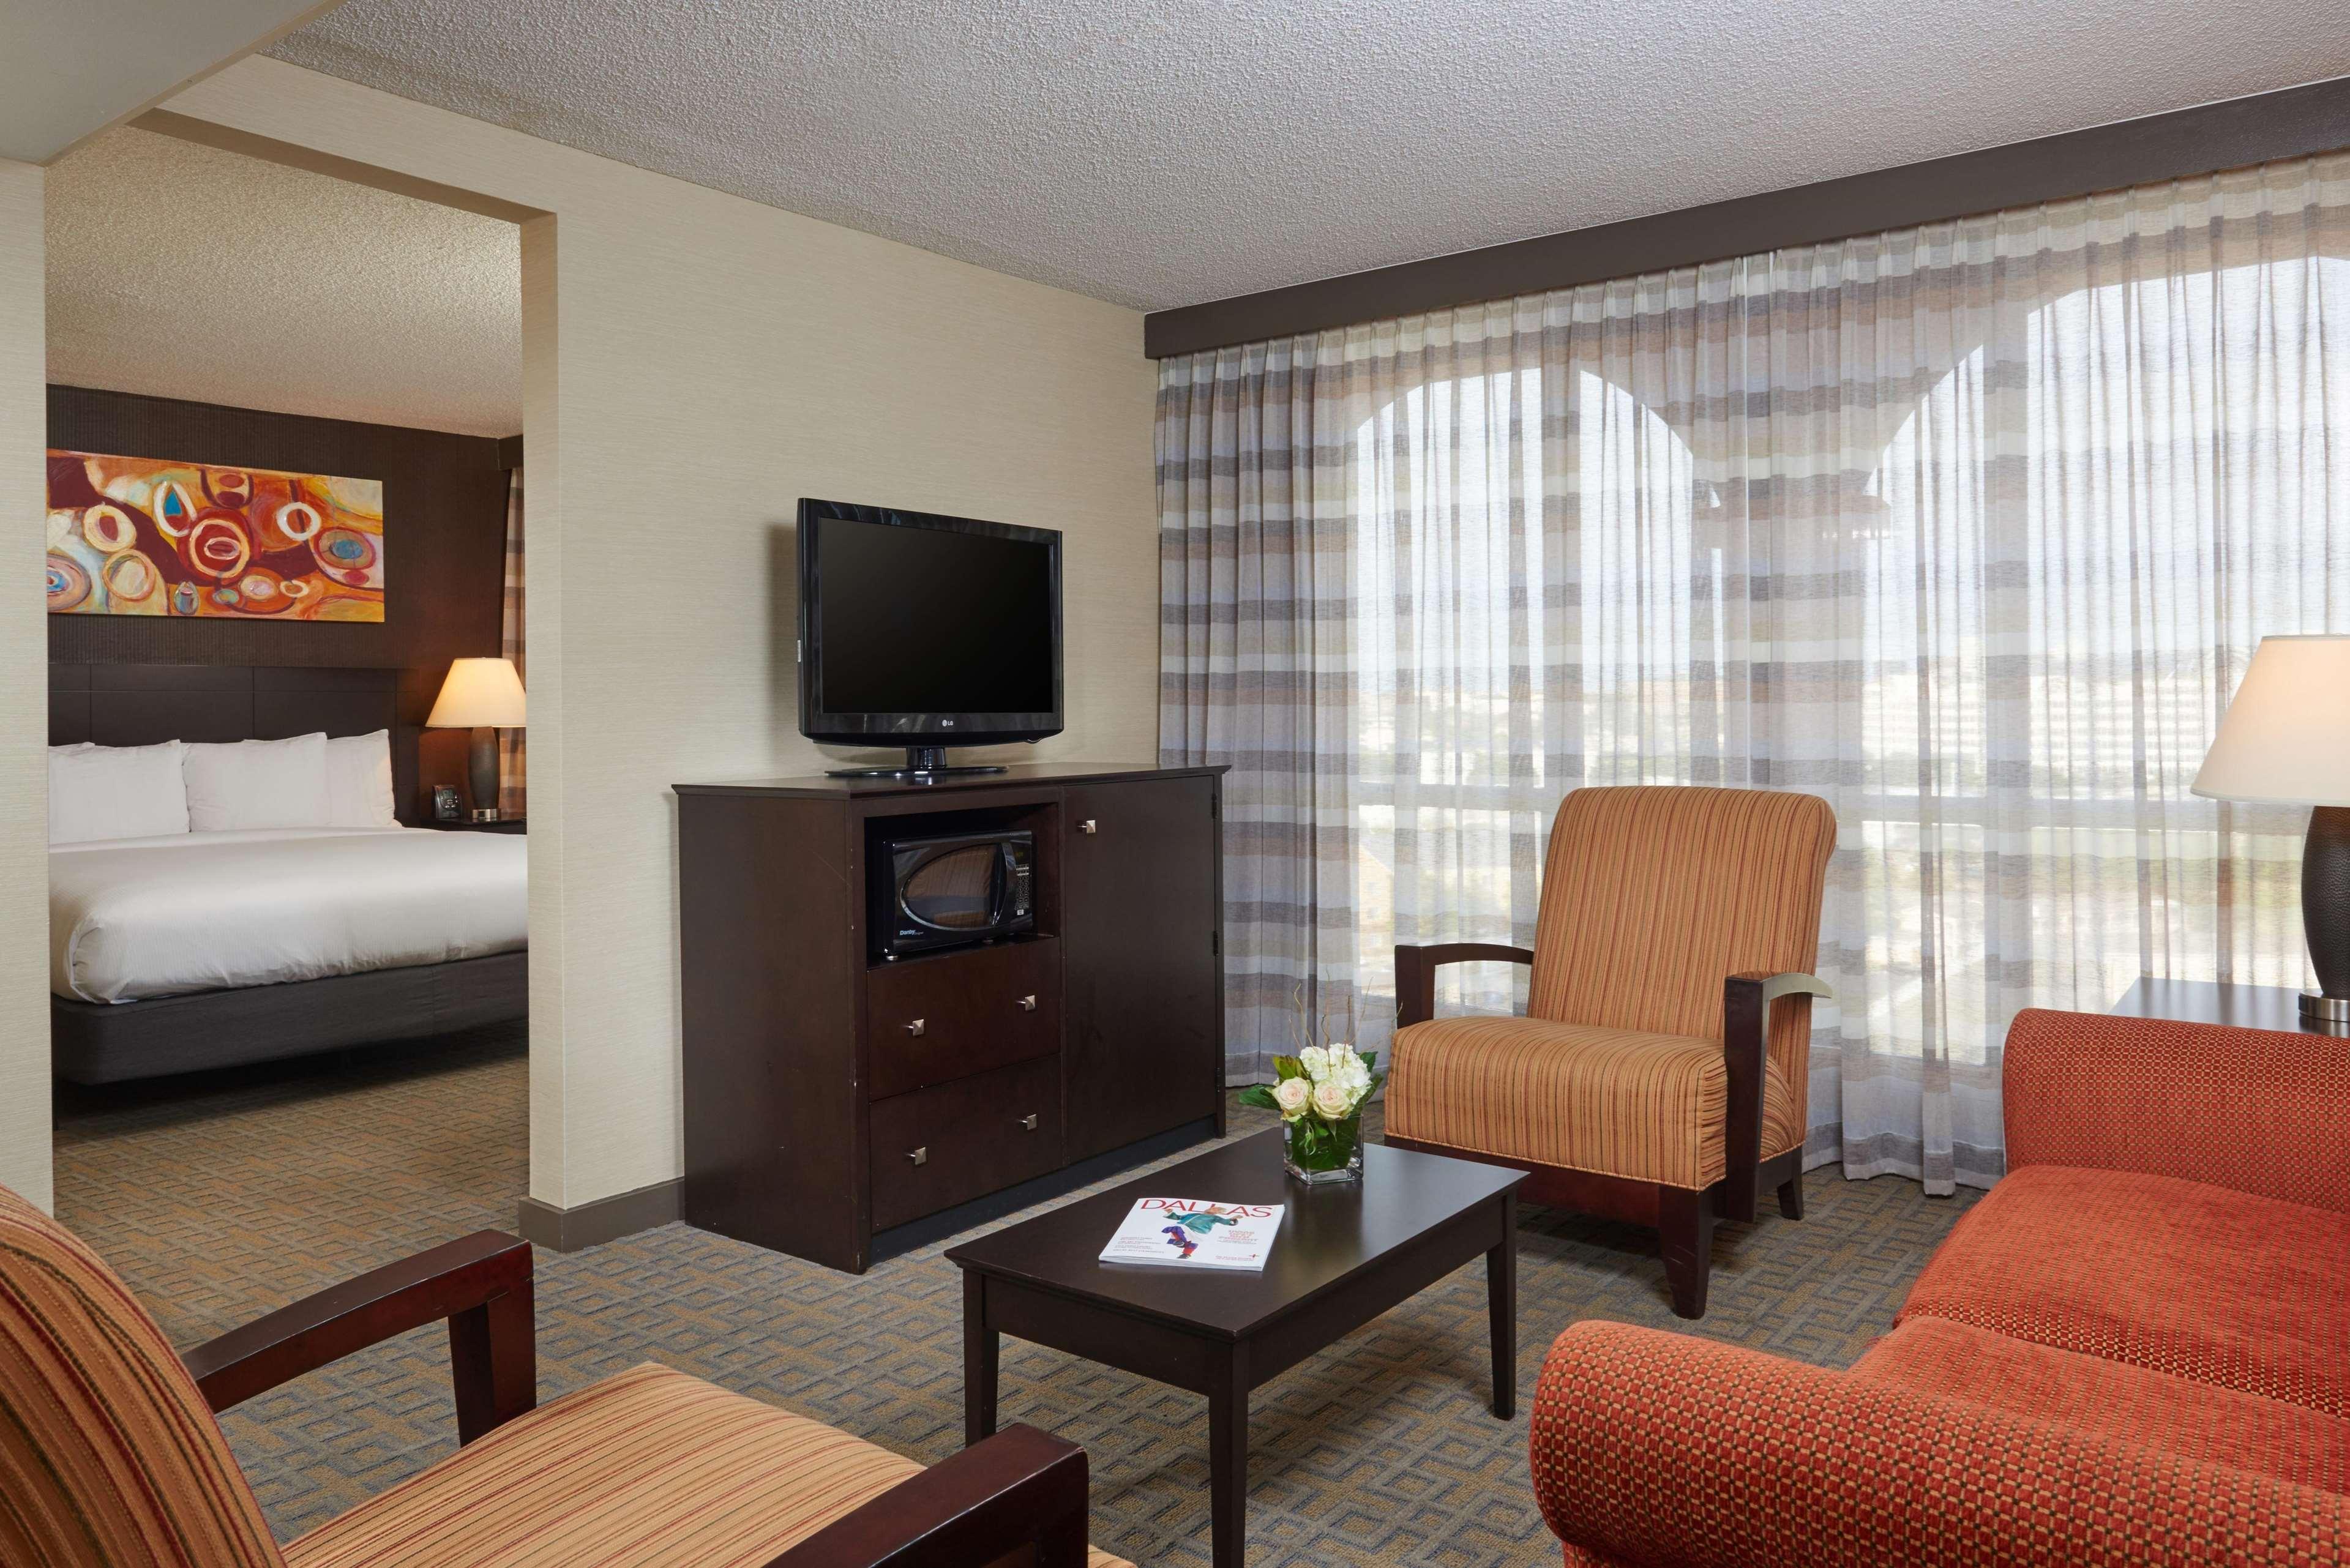 DoubleTree by Hilton Hotel Dallas - Market Center